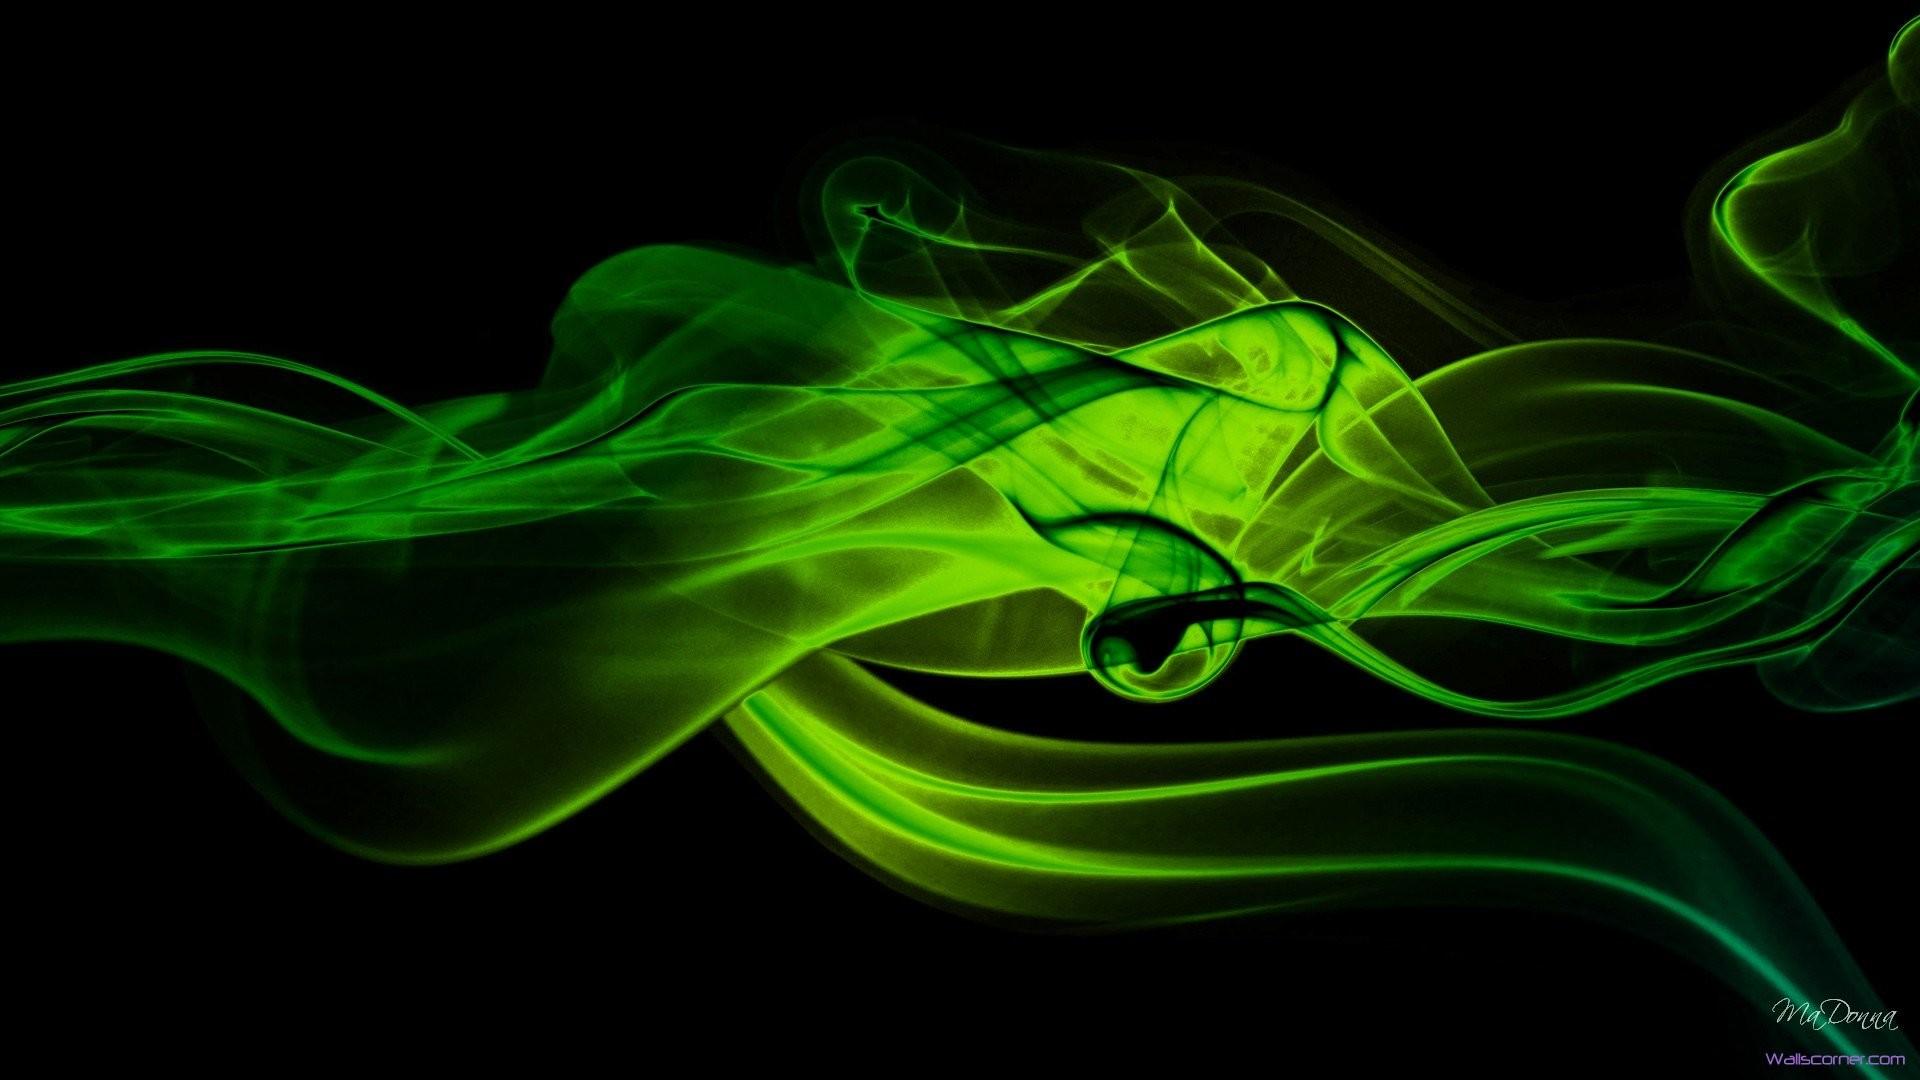 of green smoke abstract beauty green smoke abstract hd wallpaper .